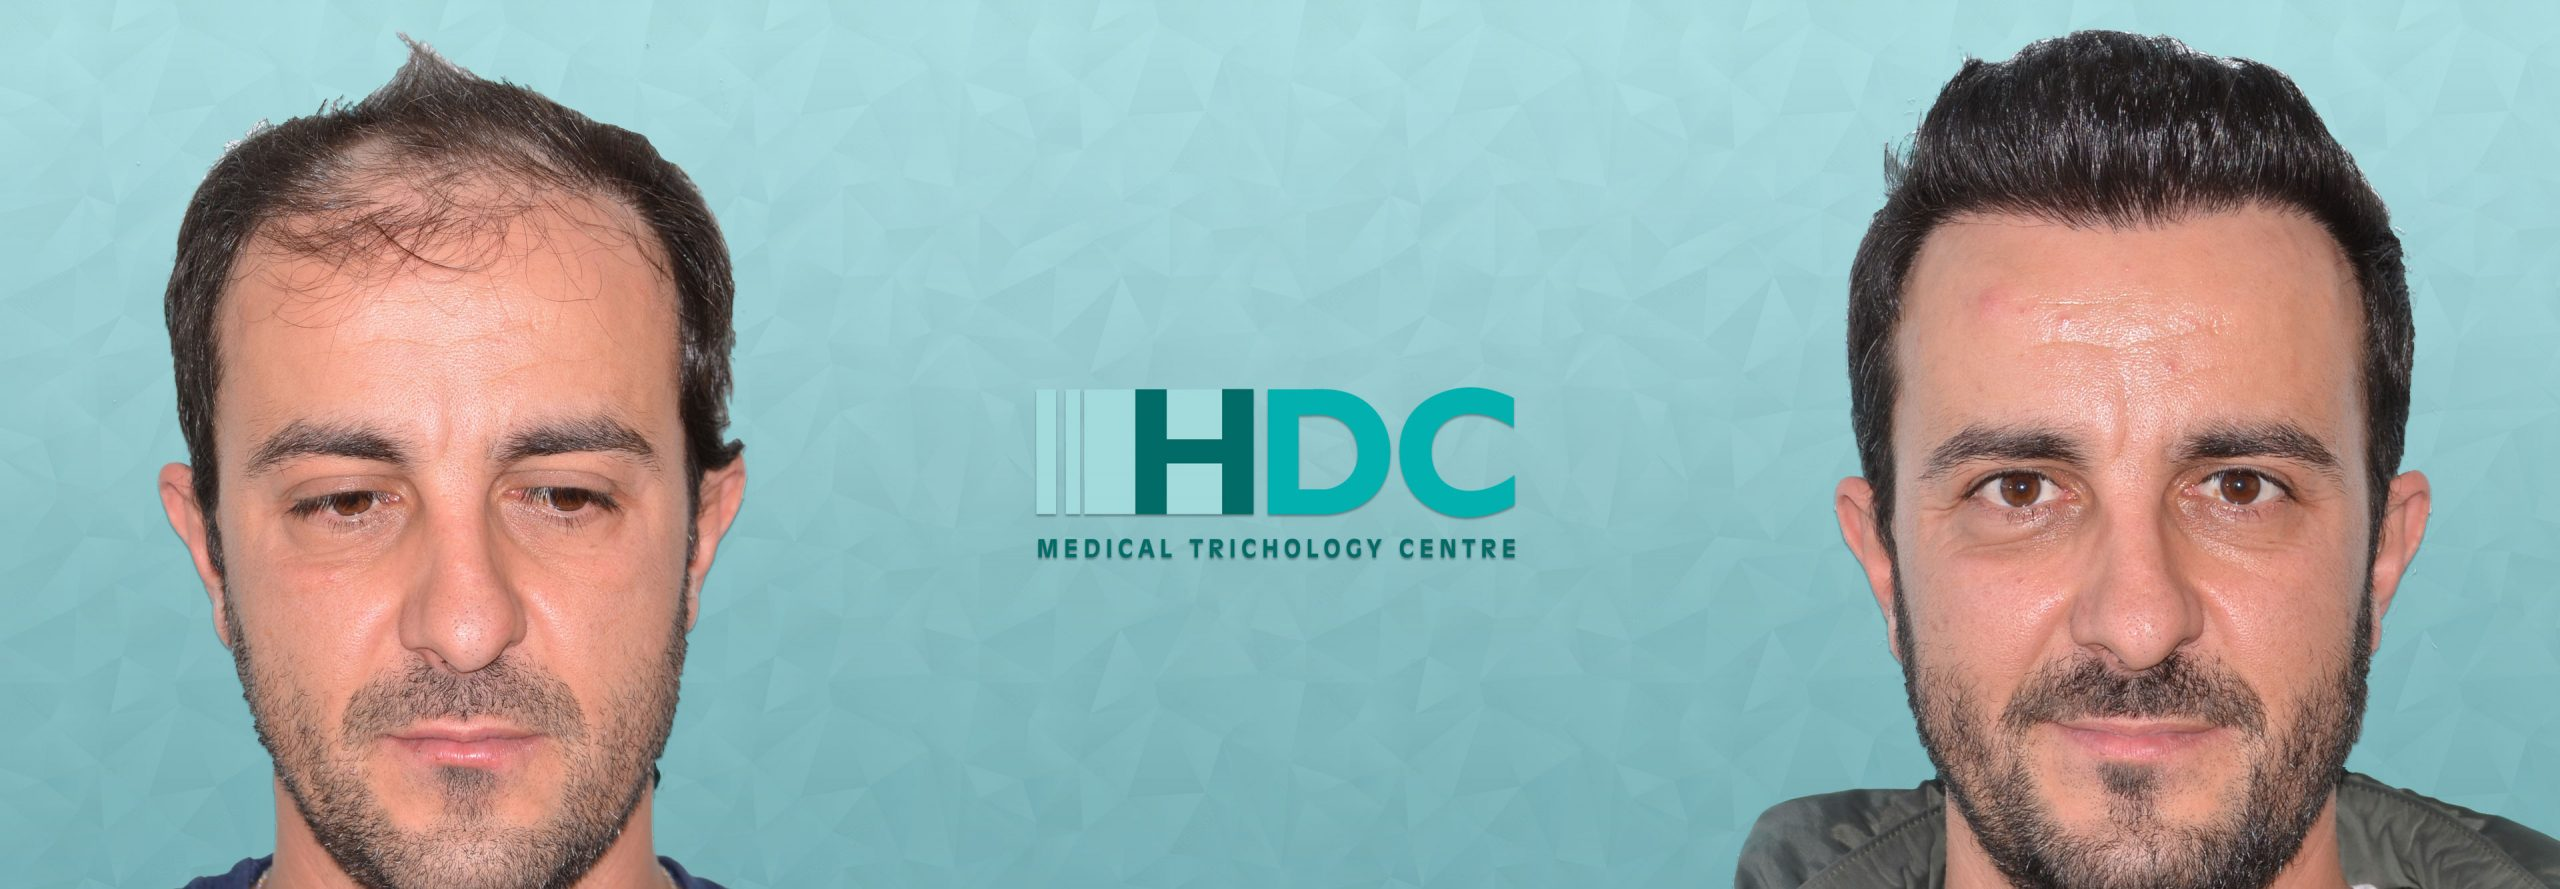 HDC המרכז להשתלות שיער